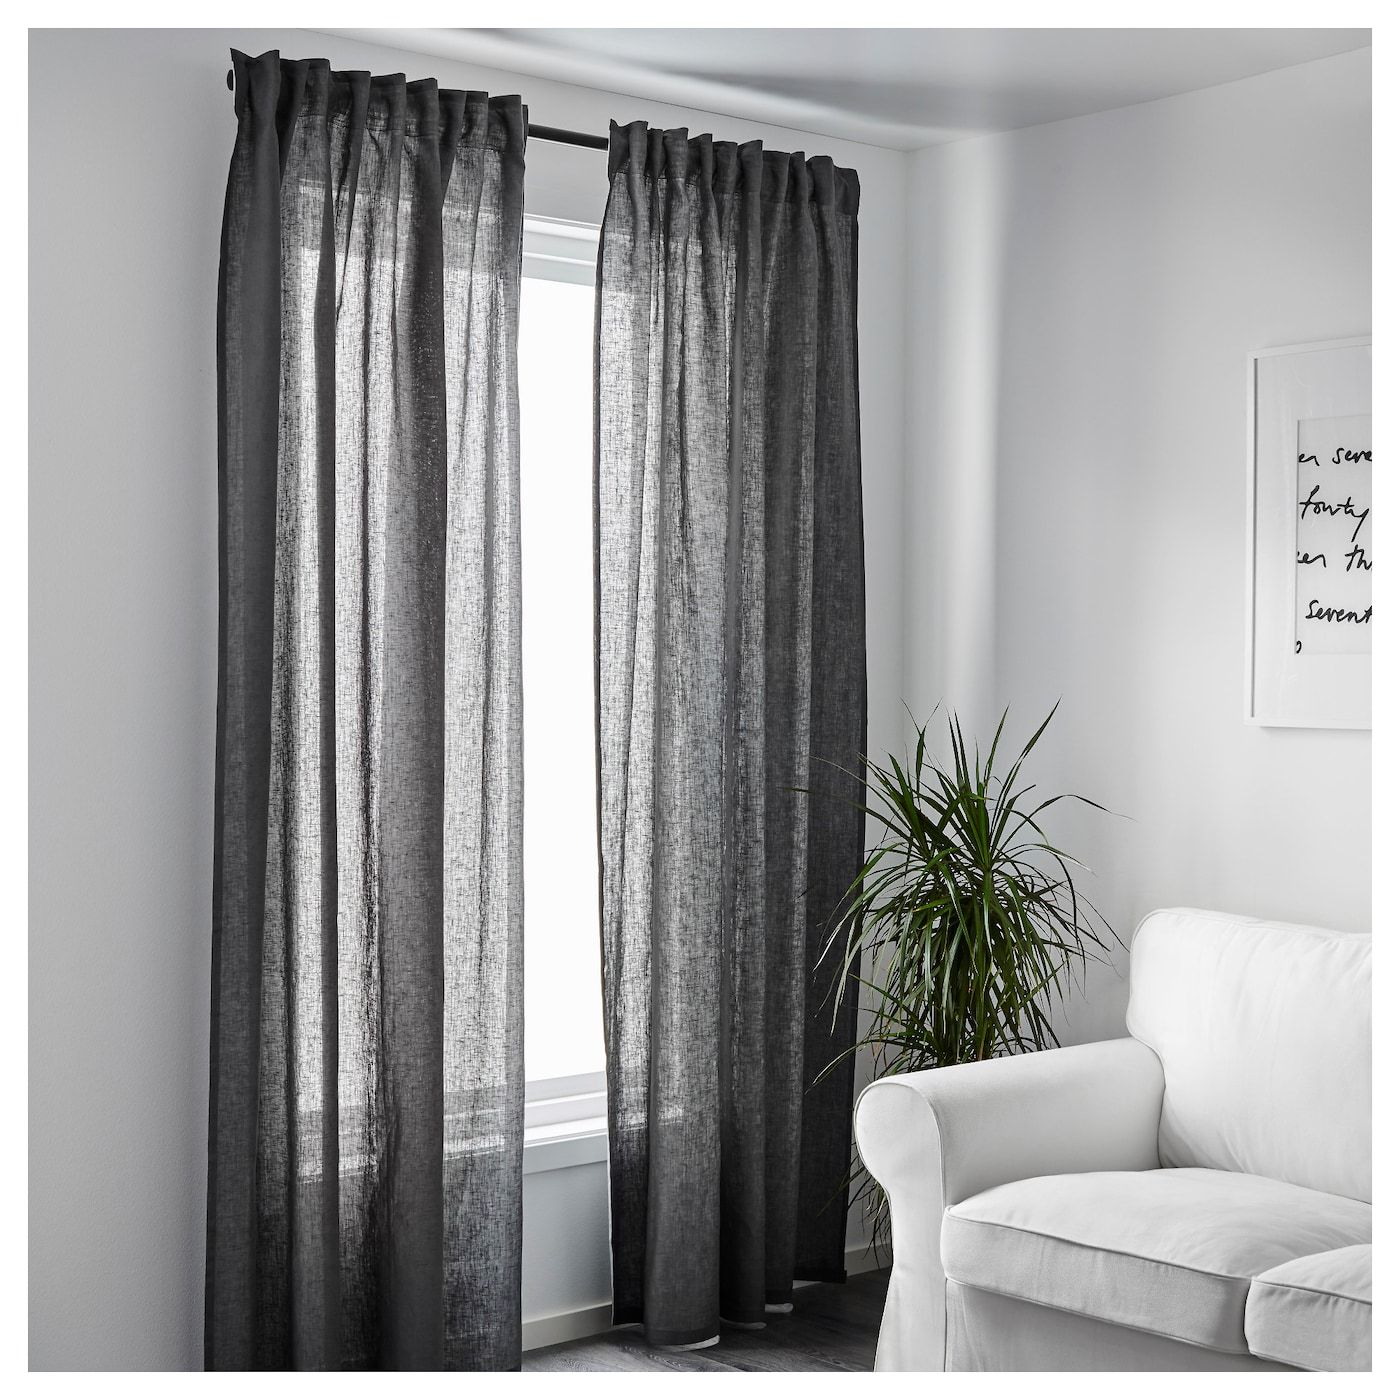 Aina Curtains 1 Pair Dark Gray 57x98 Grey Curtains Living